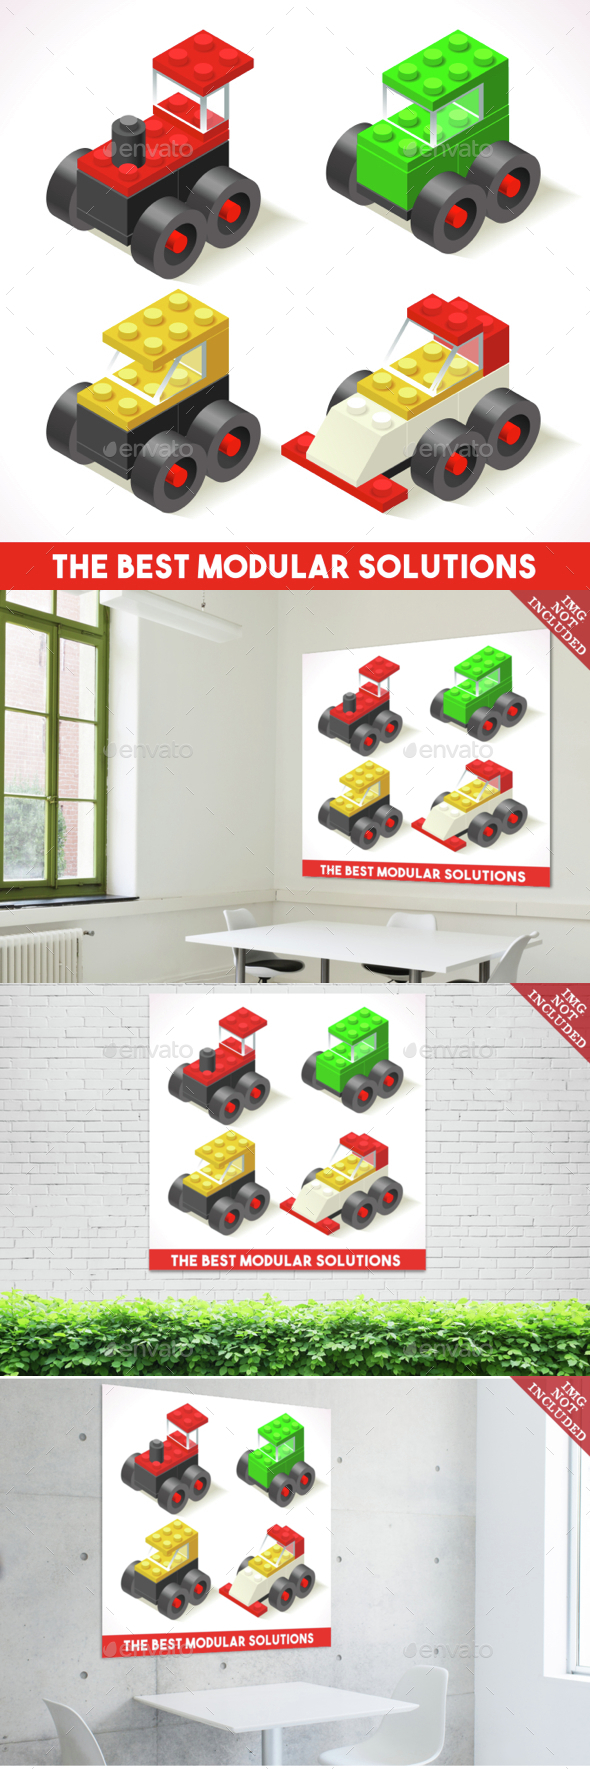 Toy Block Cars Isometric - Retro Technology